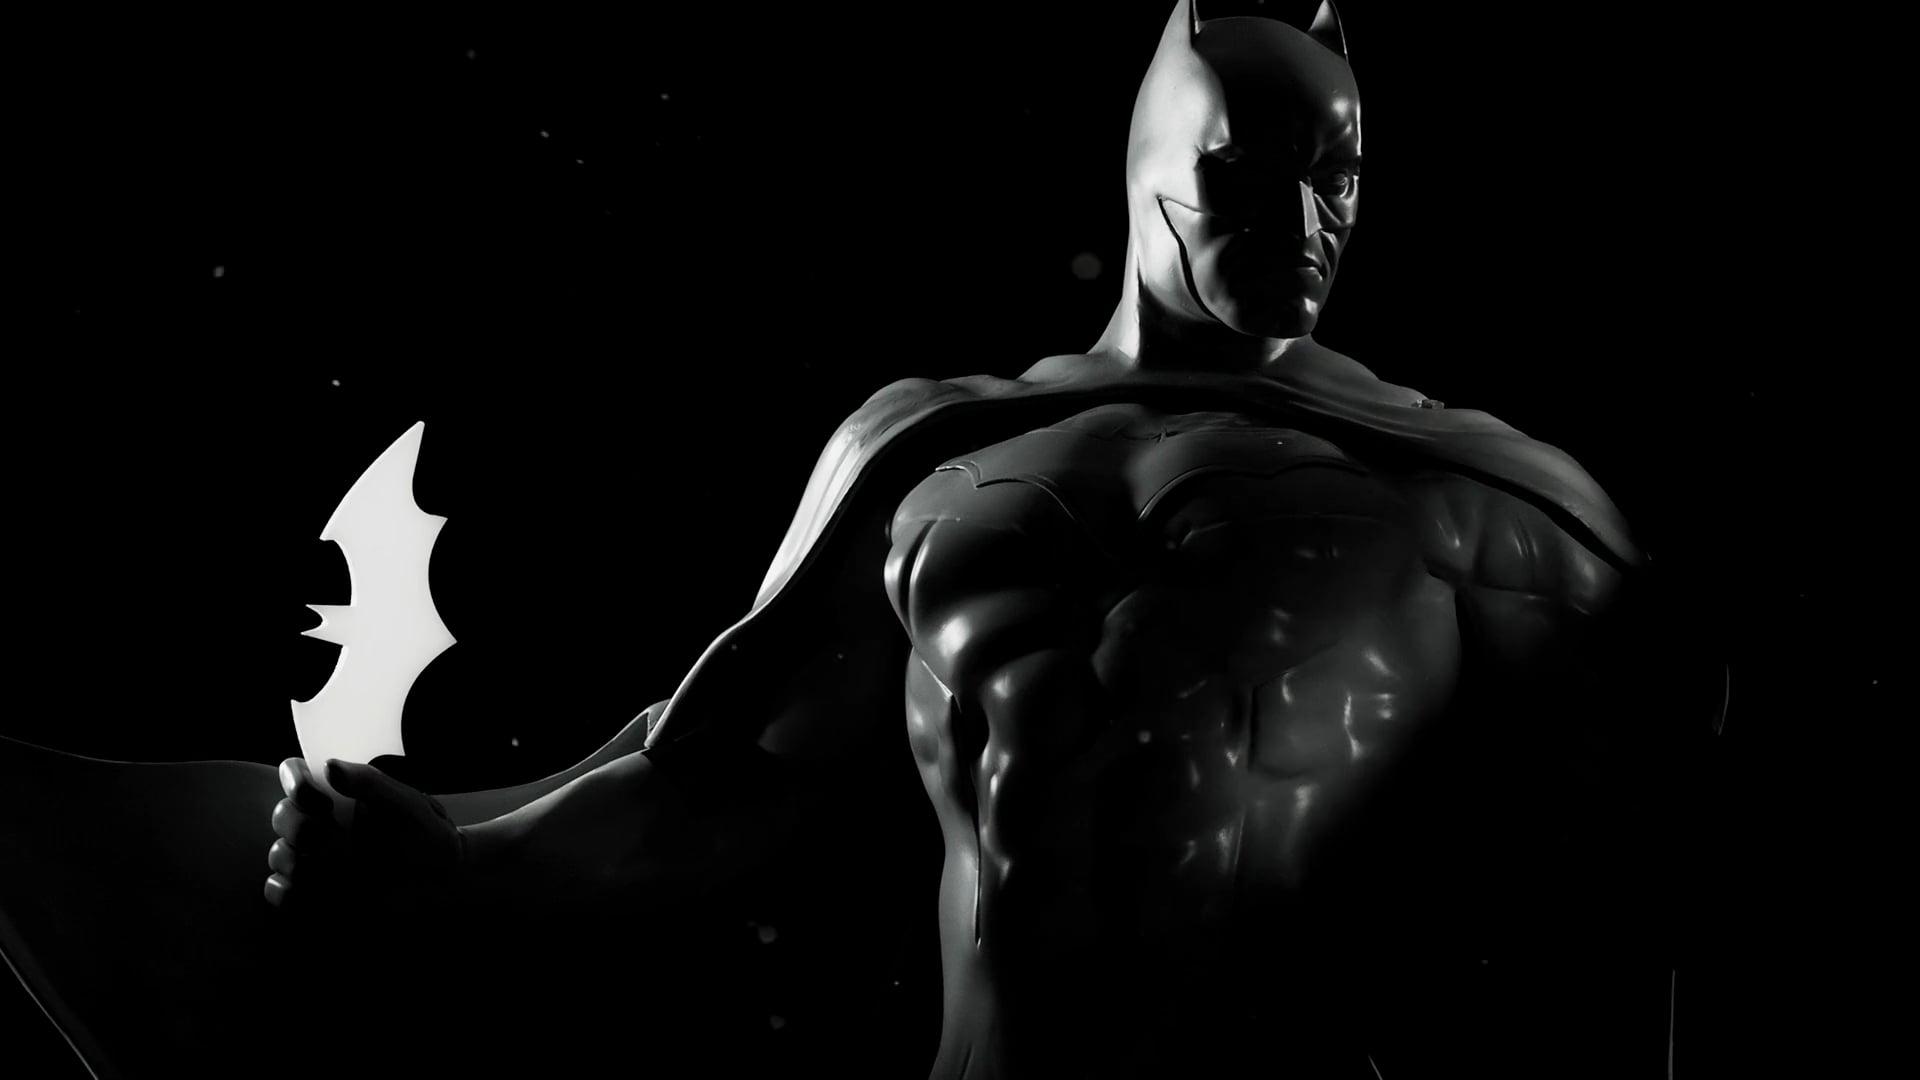 The One 蝙蝠俠80周年經典傳奇